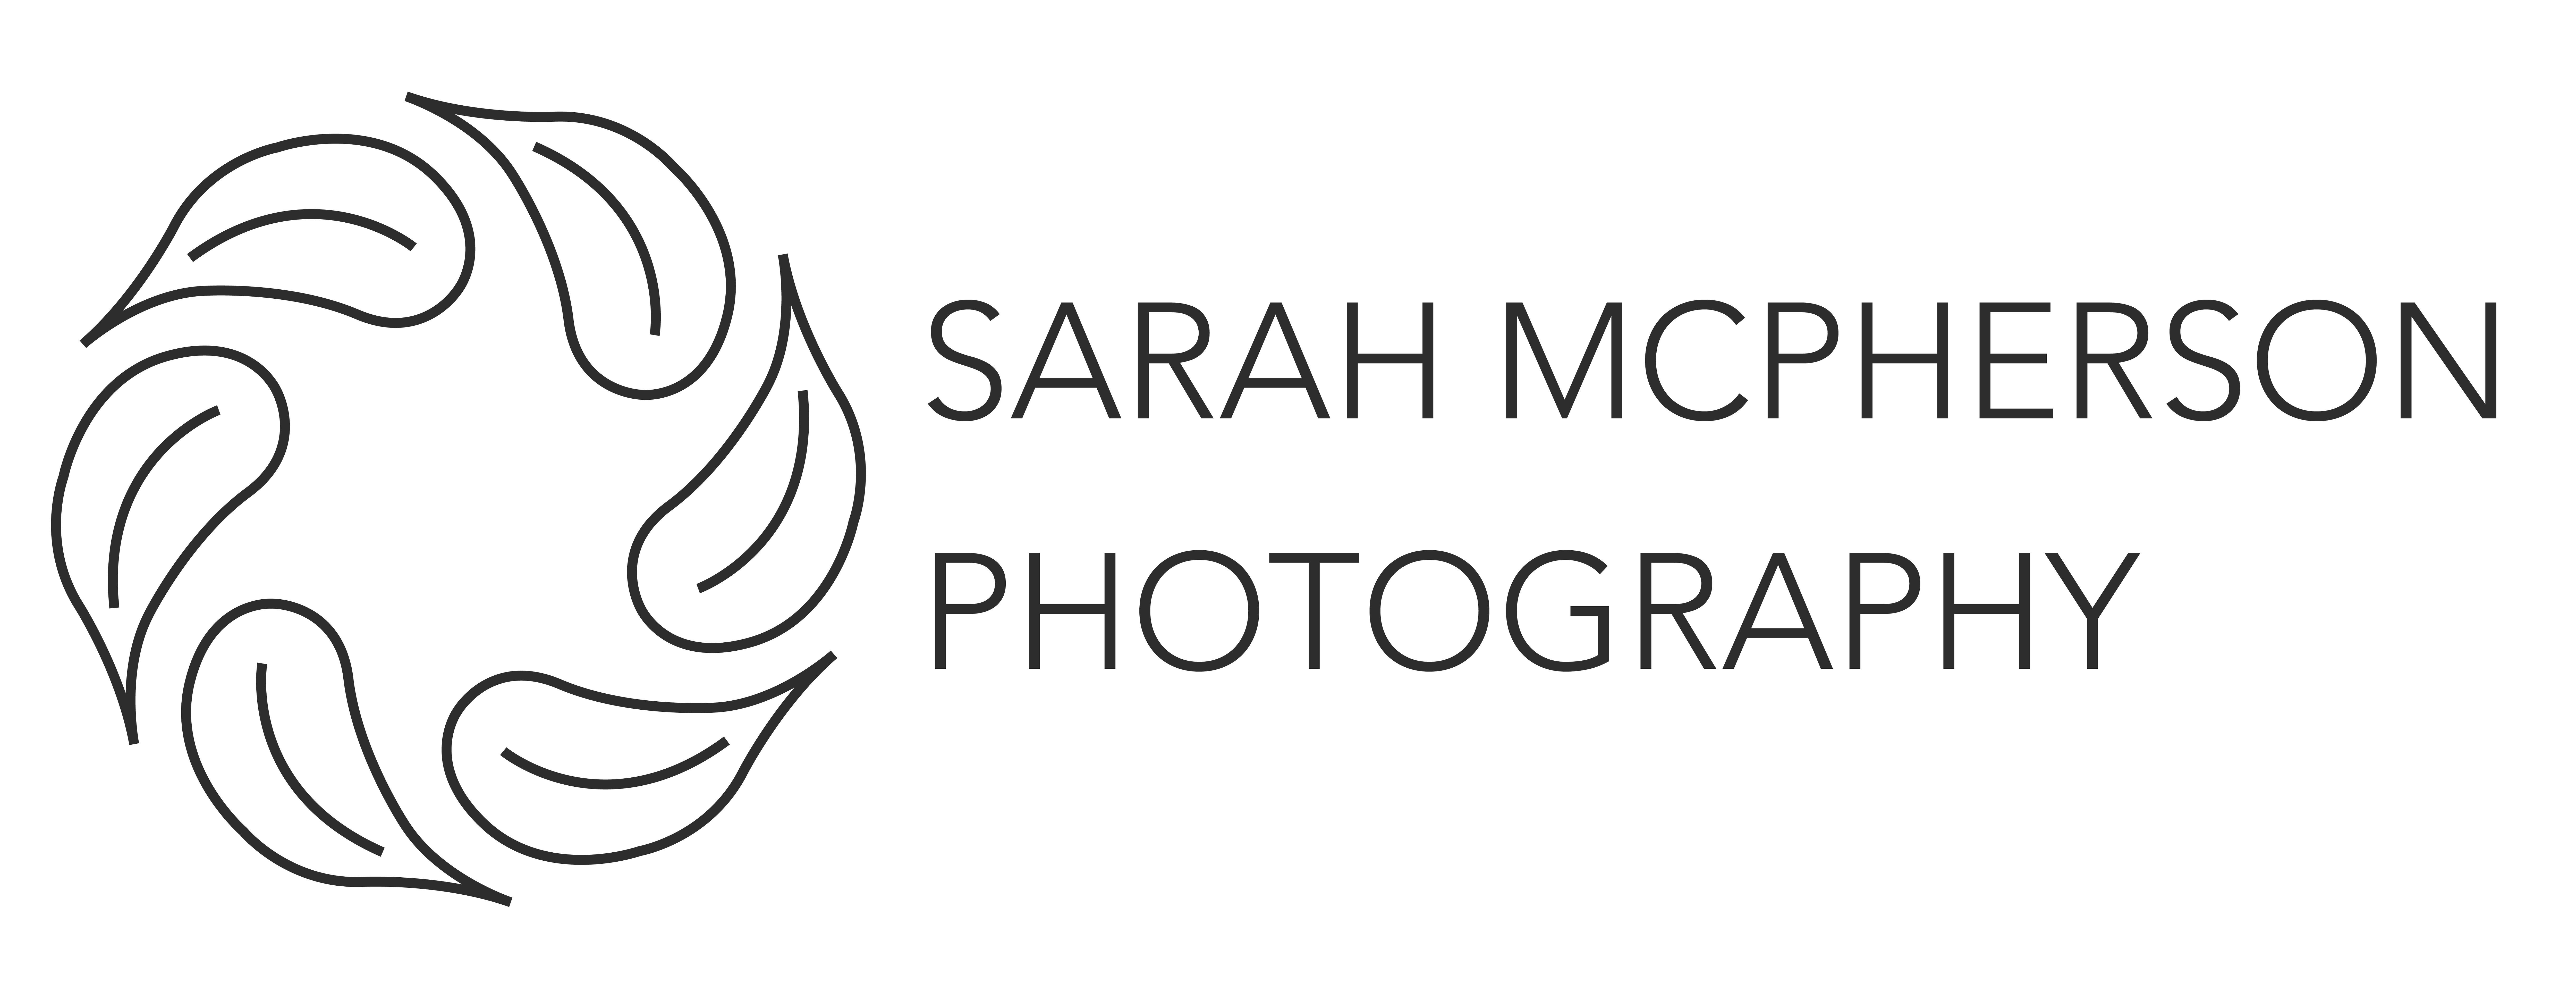 Sarah McPherson